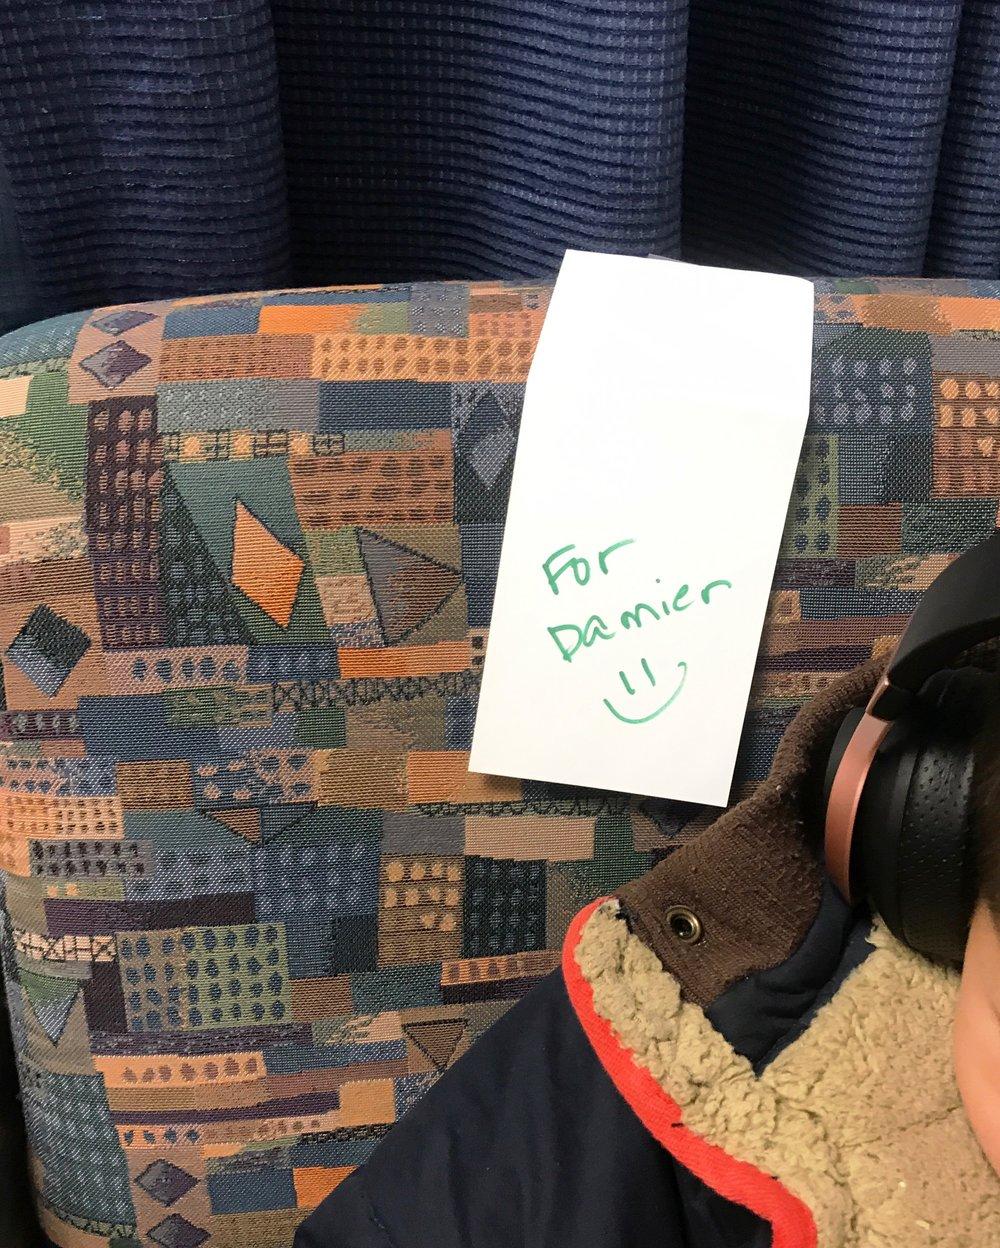 WSU Professor Kindness | TetherAndFly.com